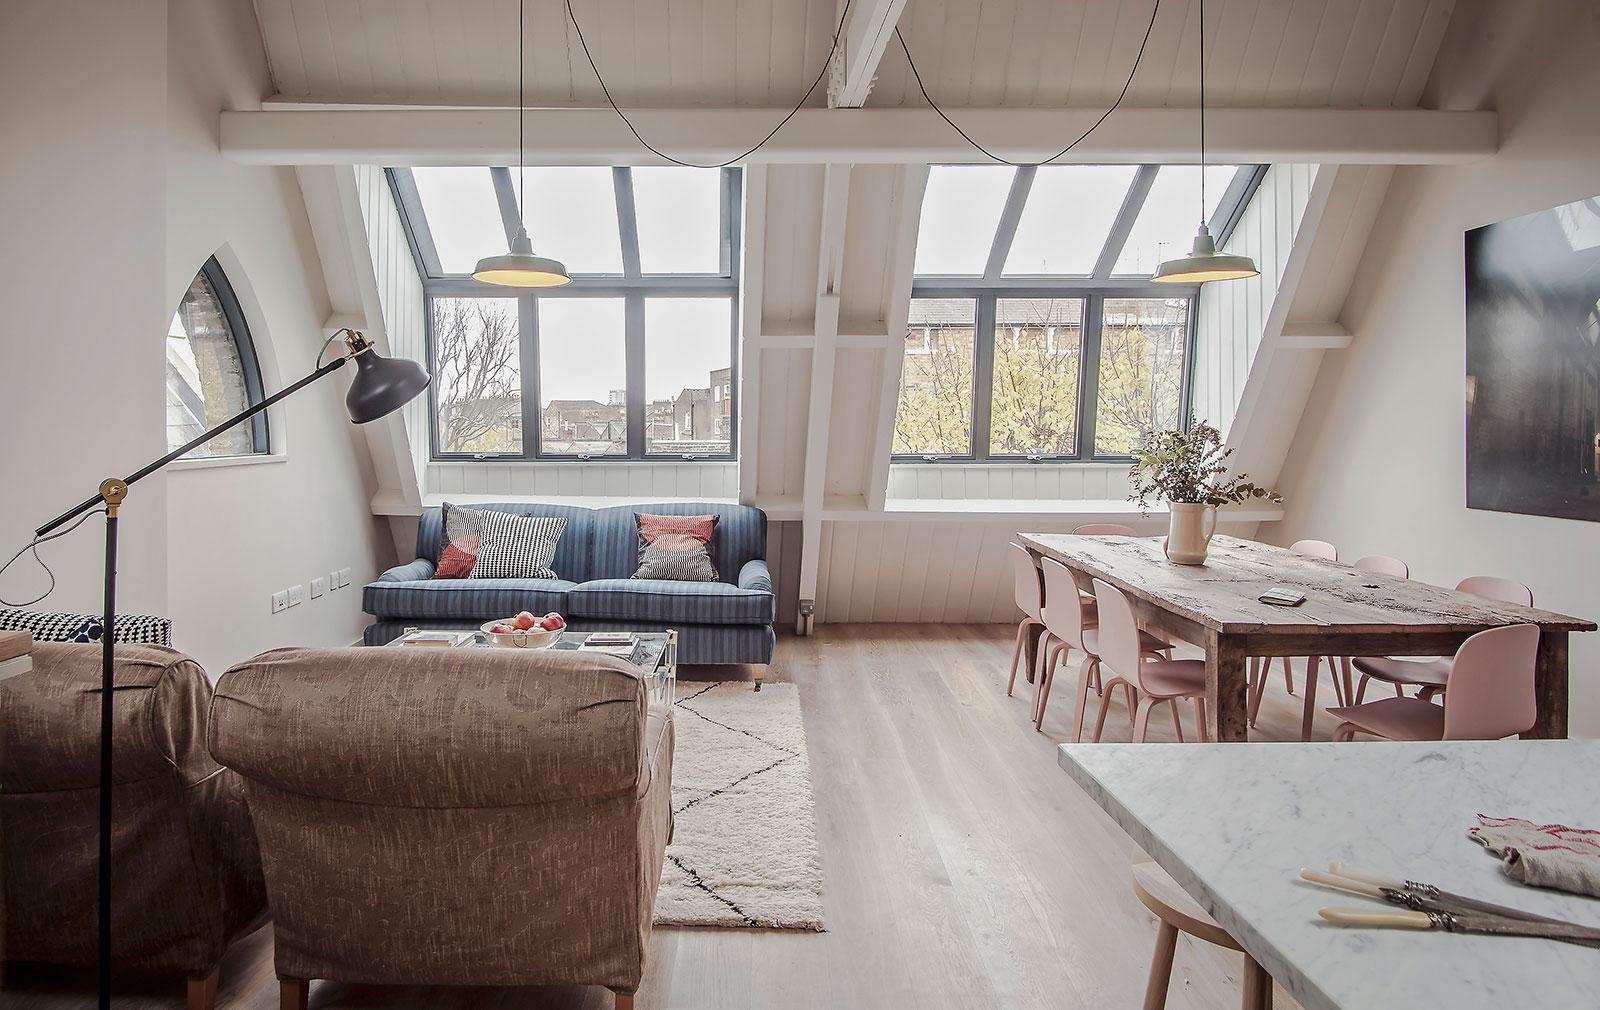 Properties Go On Sale Inside Grange Hall A Converted School In London